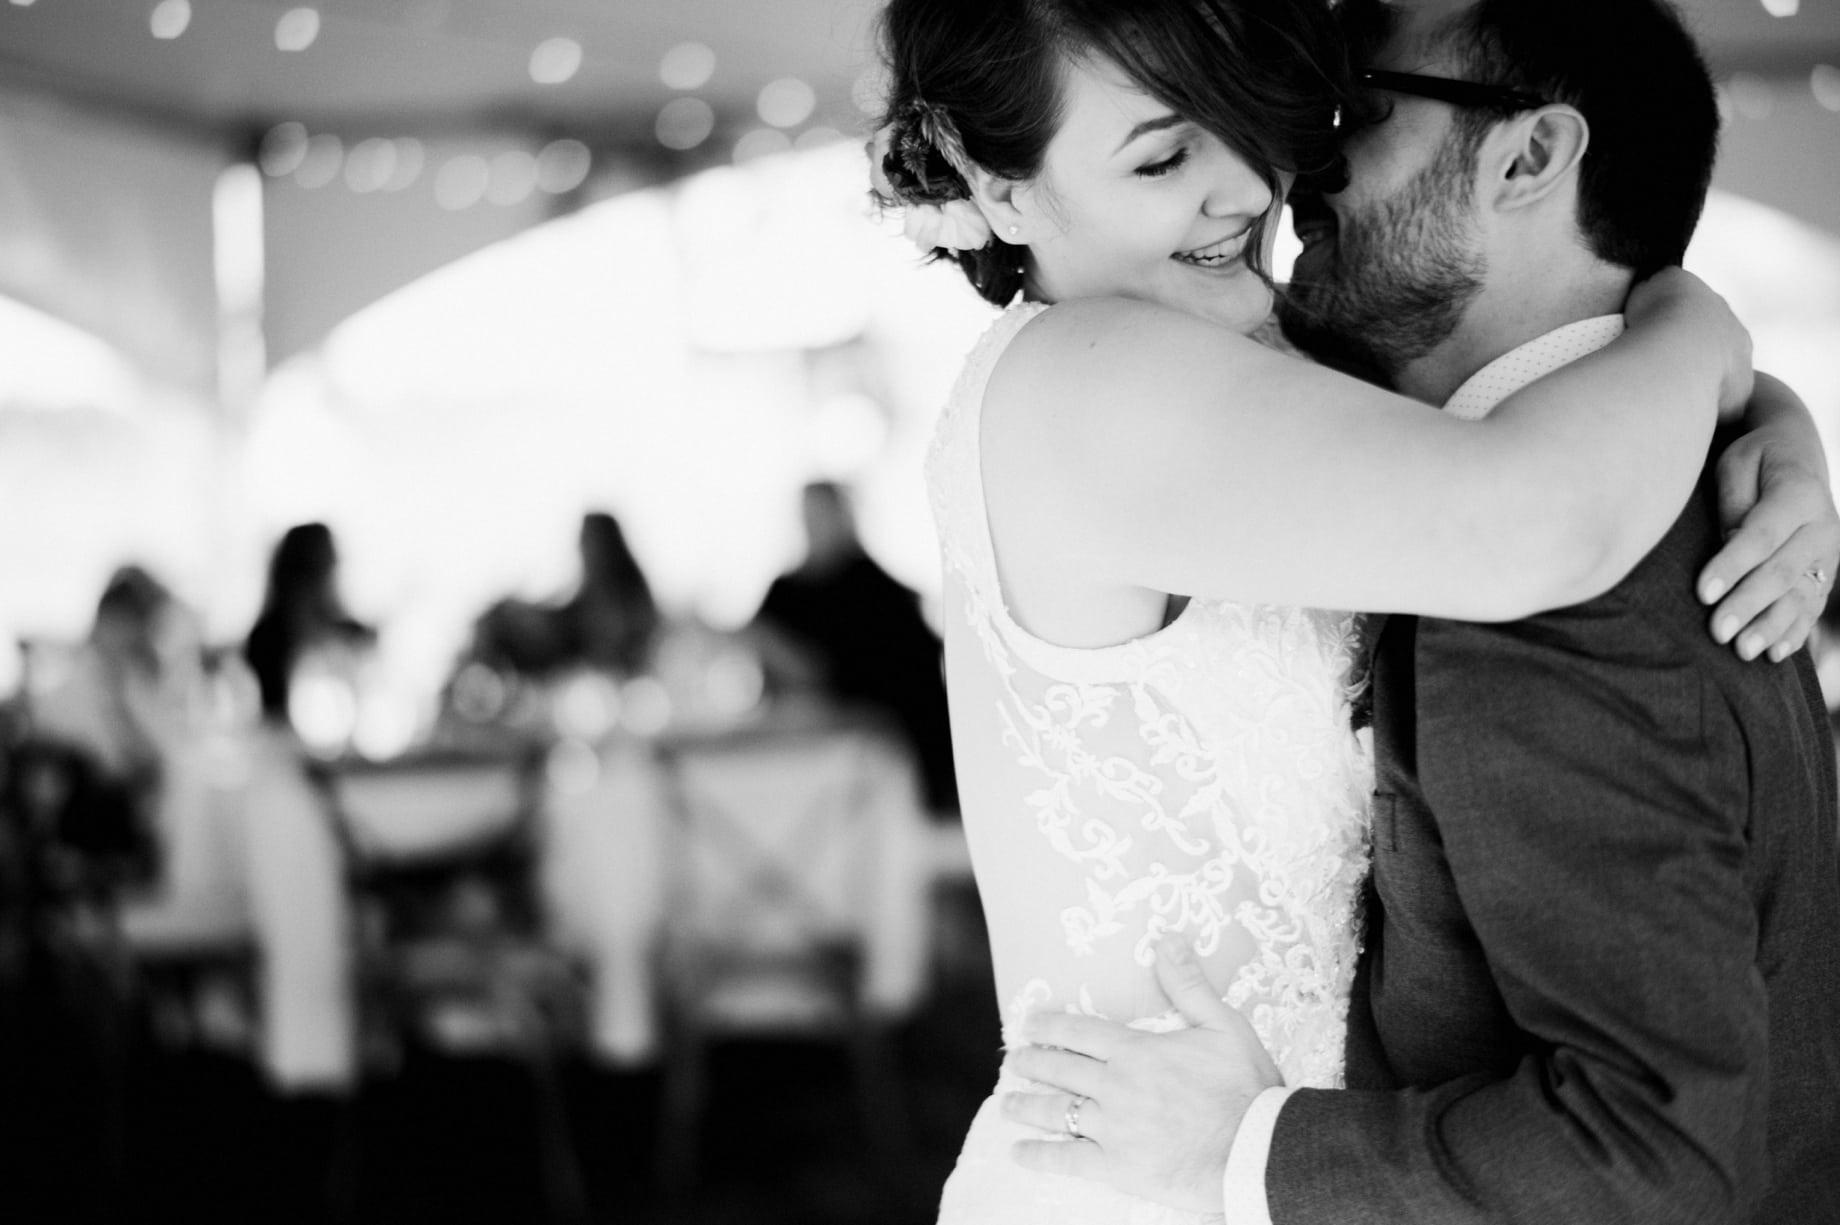 groom stealing a kiss